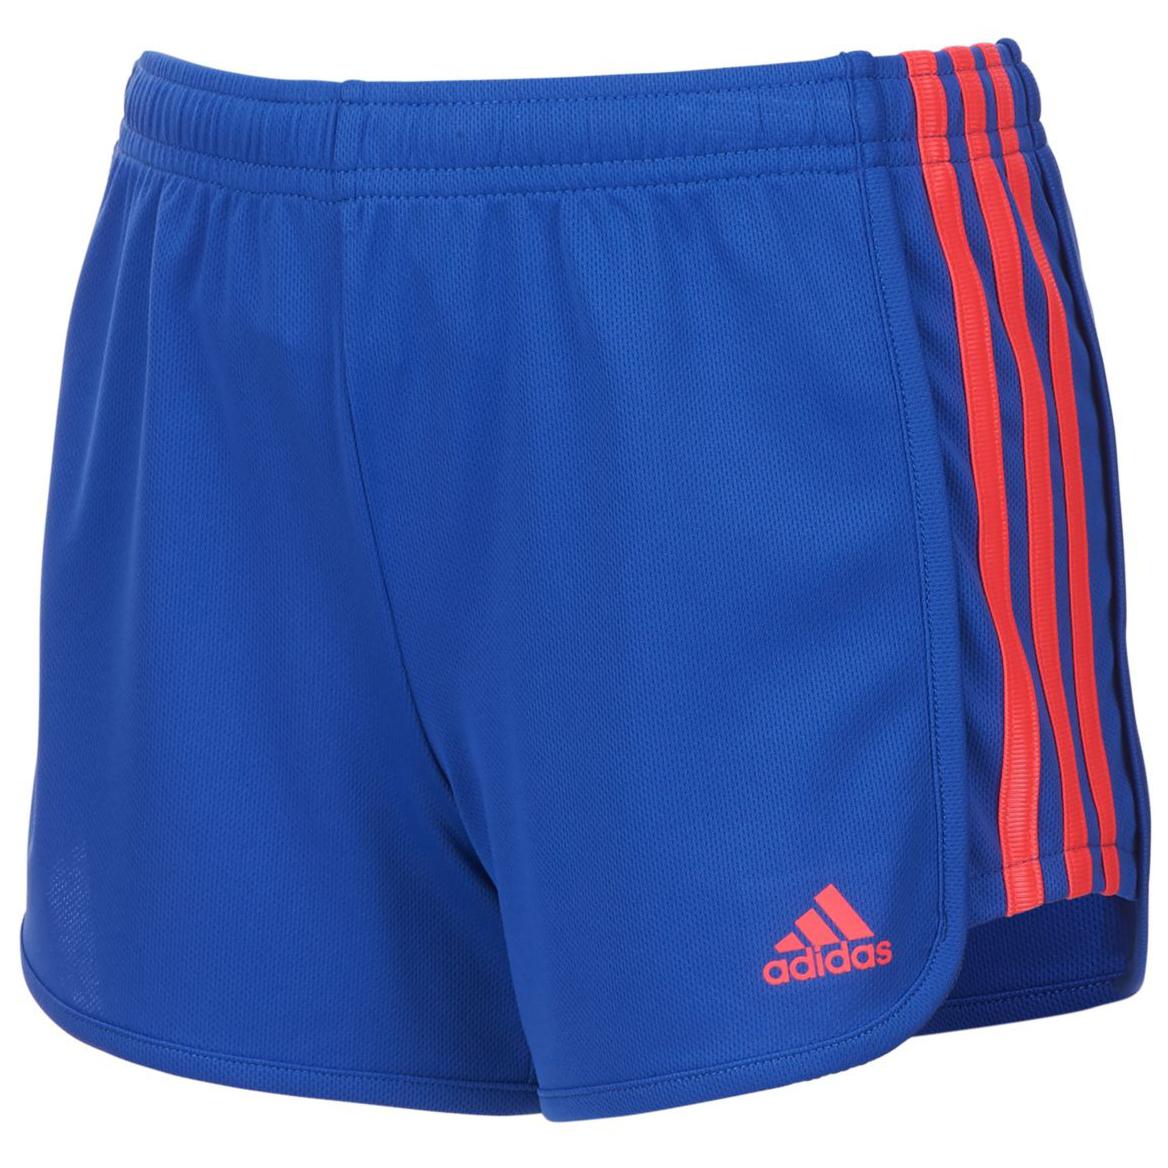 Adidas Little Girls' Three-Stripe Mesh Shorts - Blue, 6X